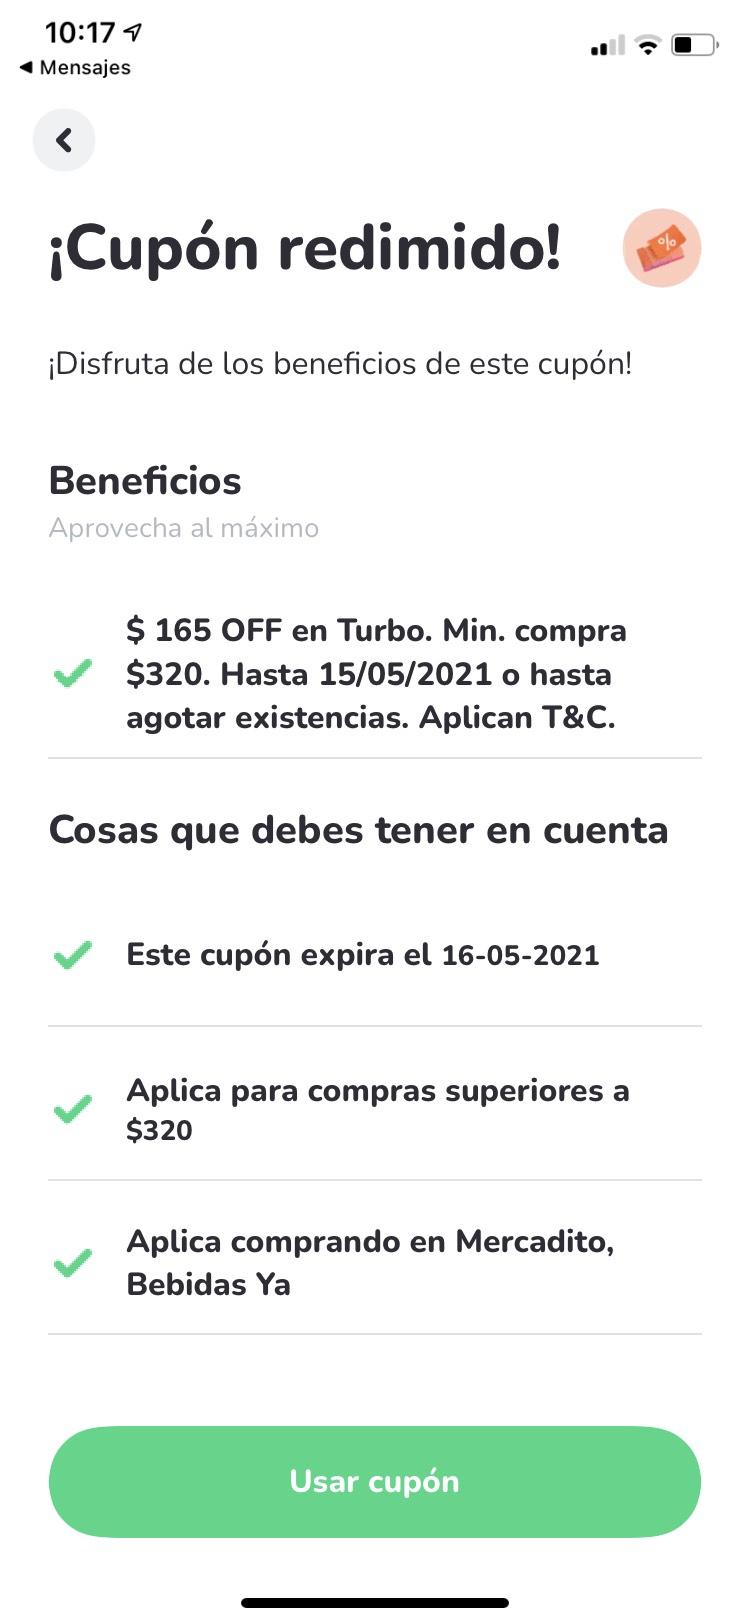 Rappi: Descuento de $165 MXN en Turbo